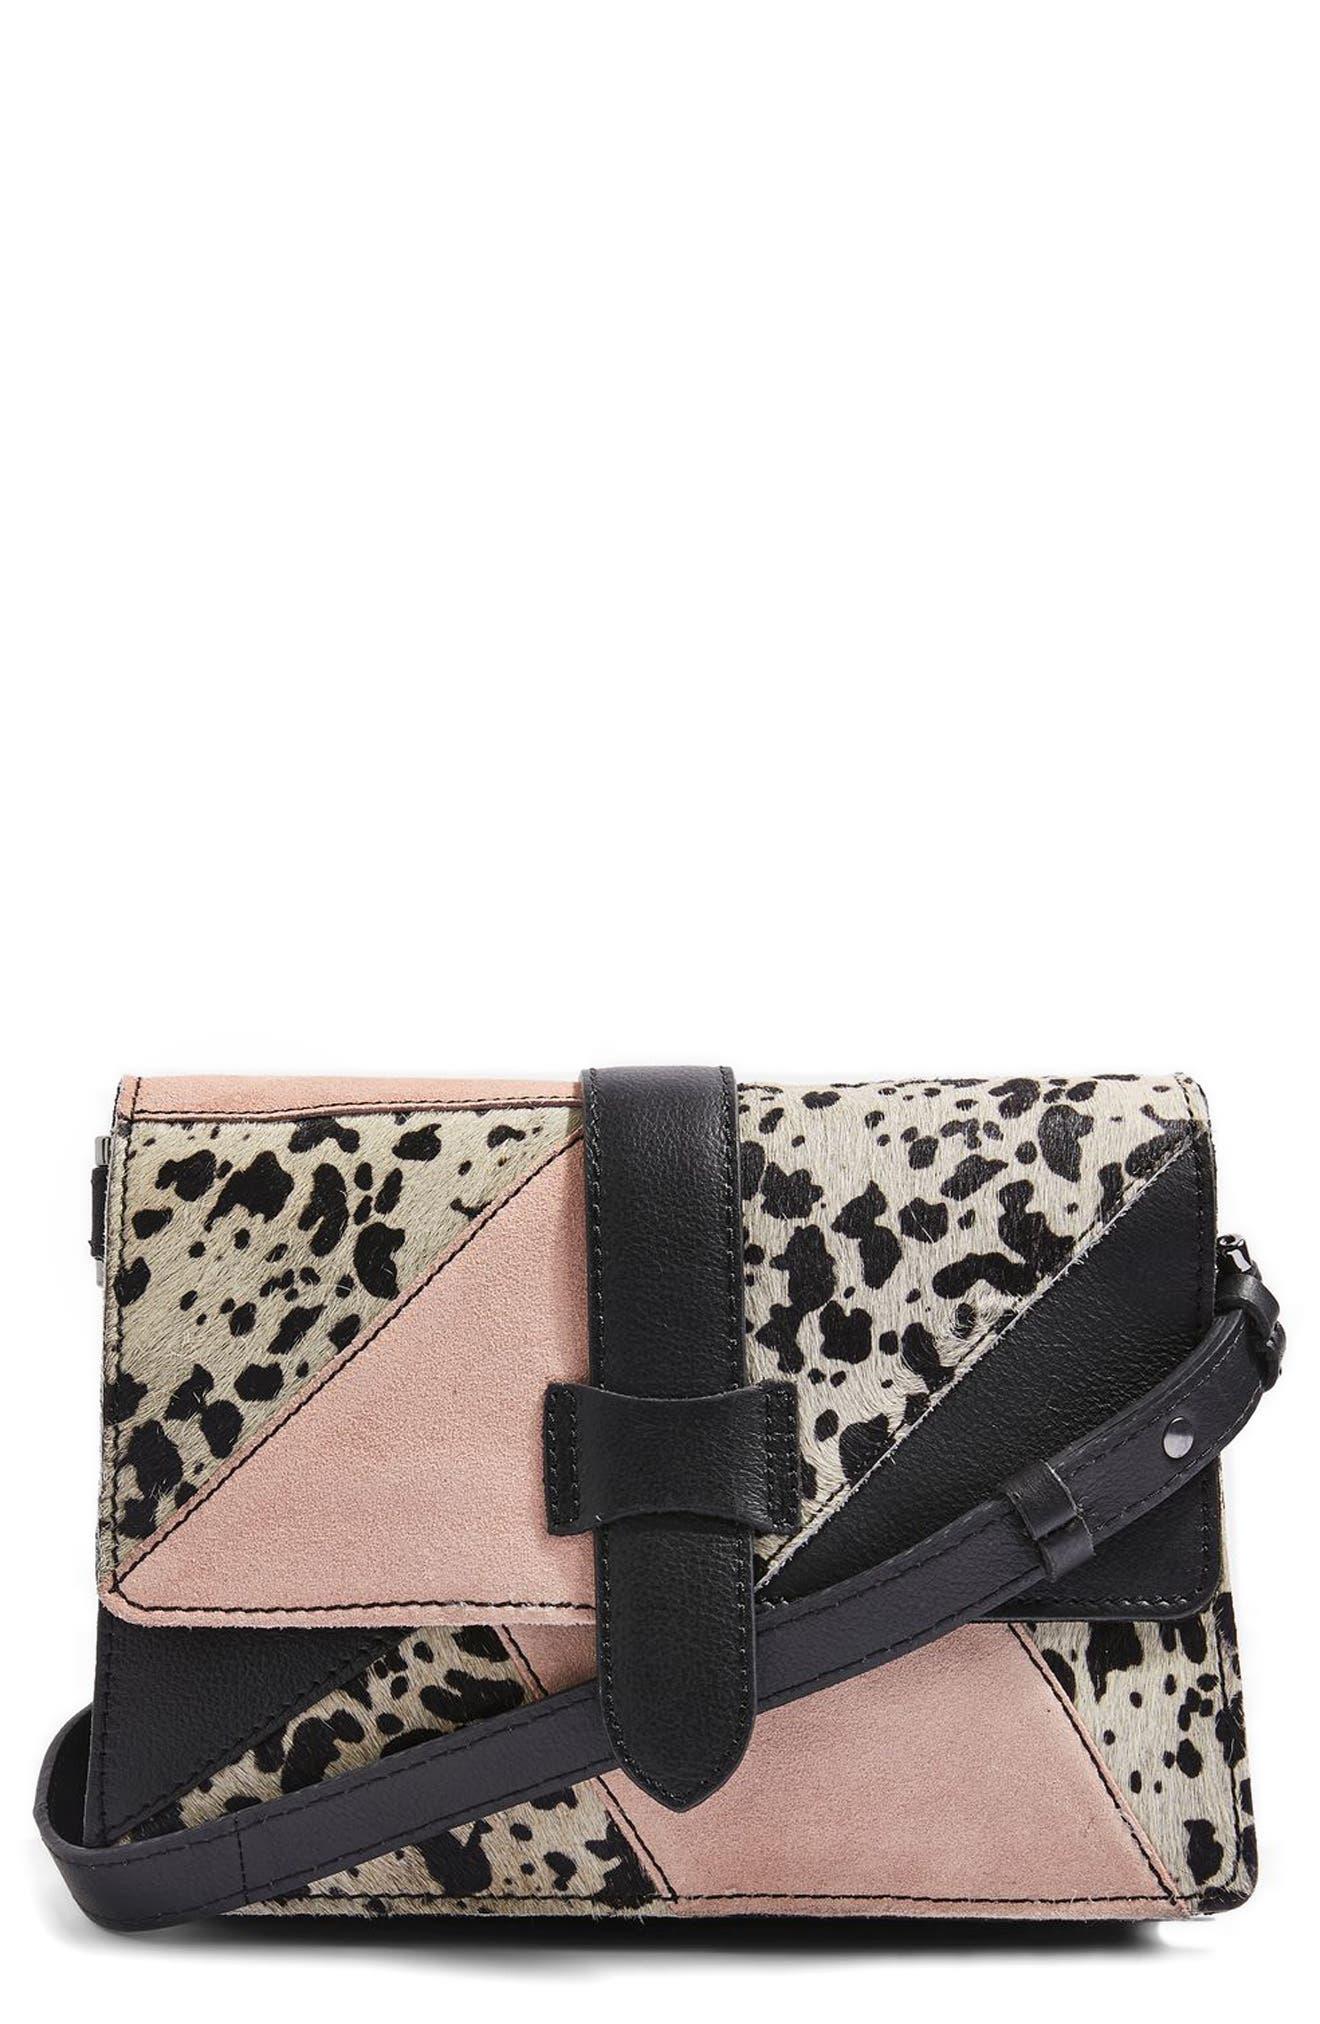 Main Image - Topshop Premium Leather & Genuine Calf Hair Patchwork Crossbody Bag